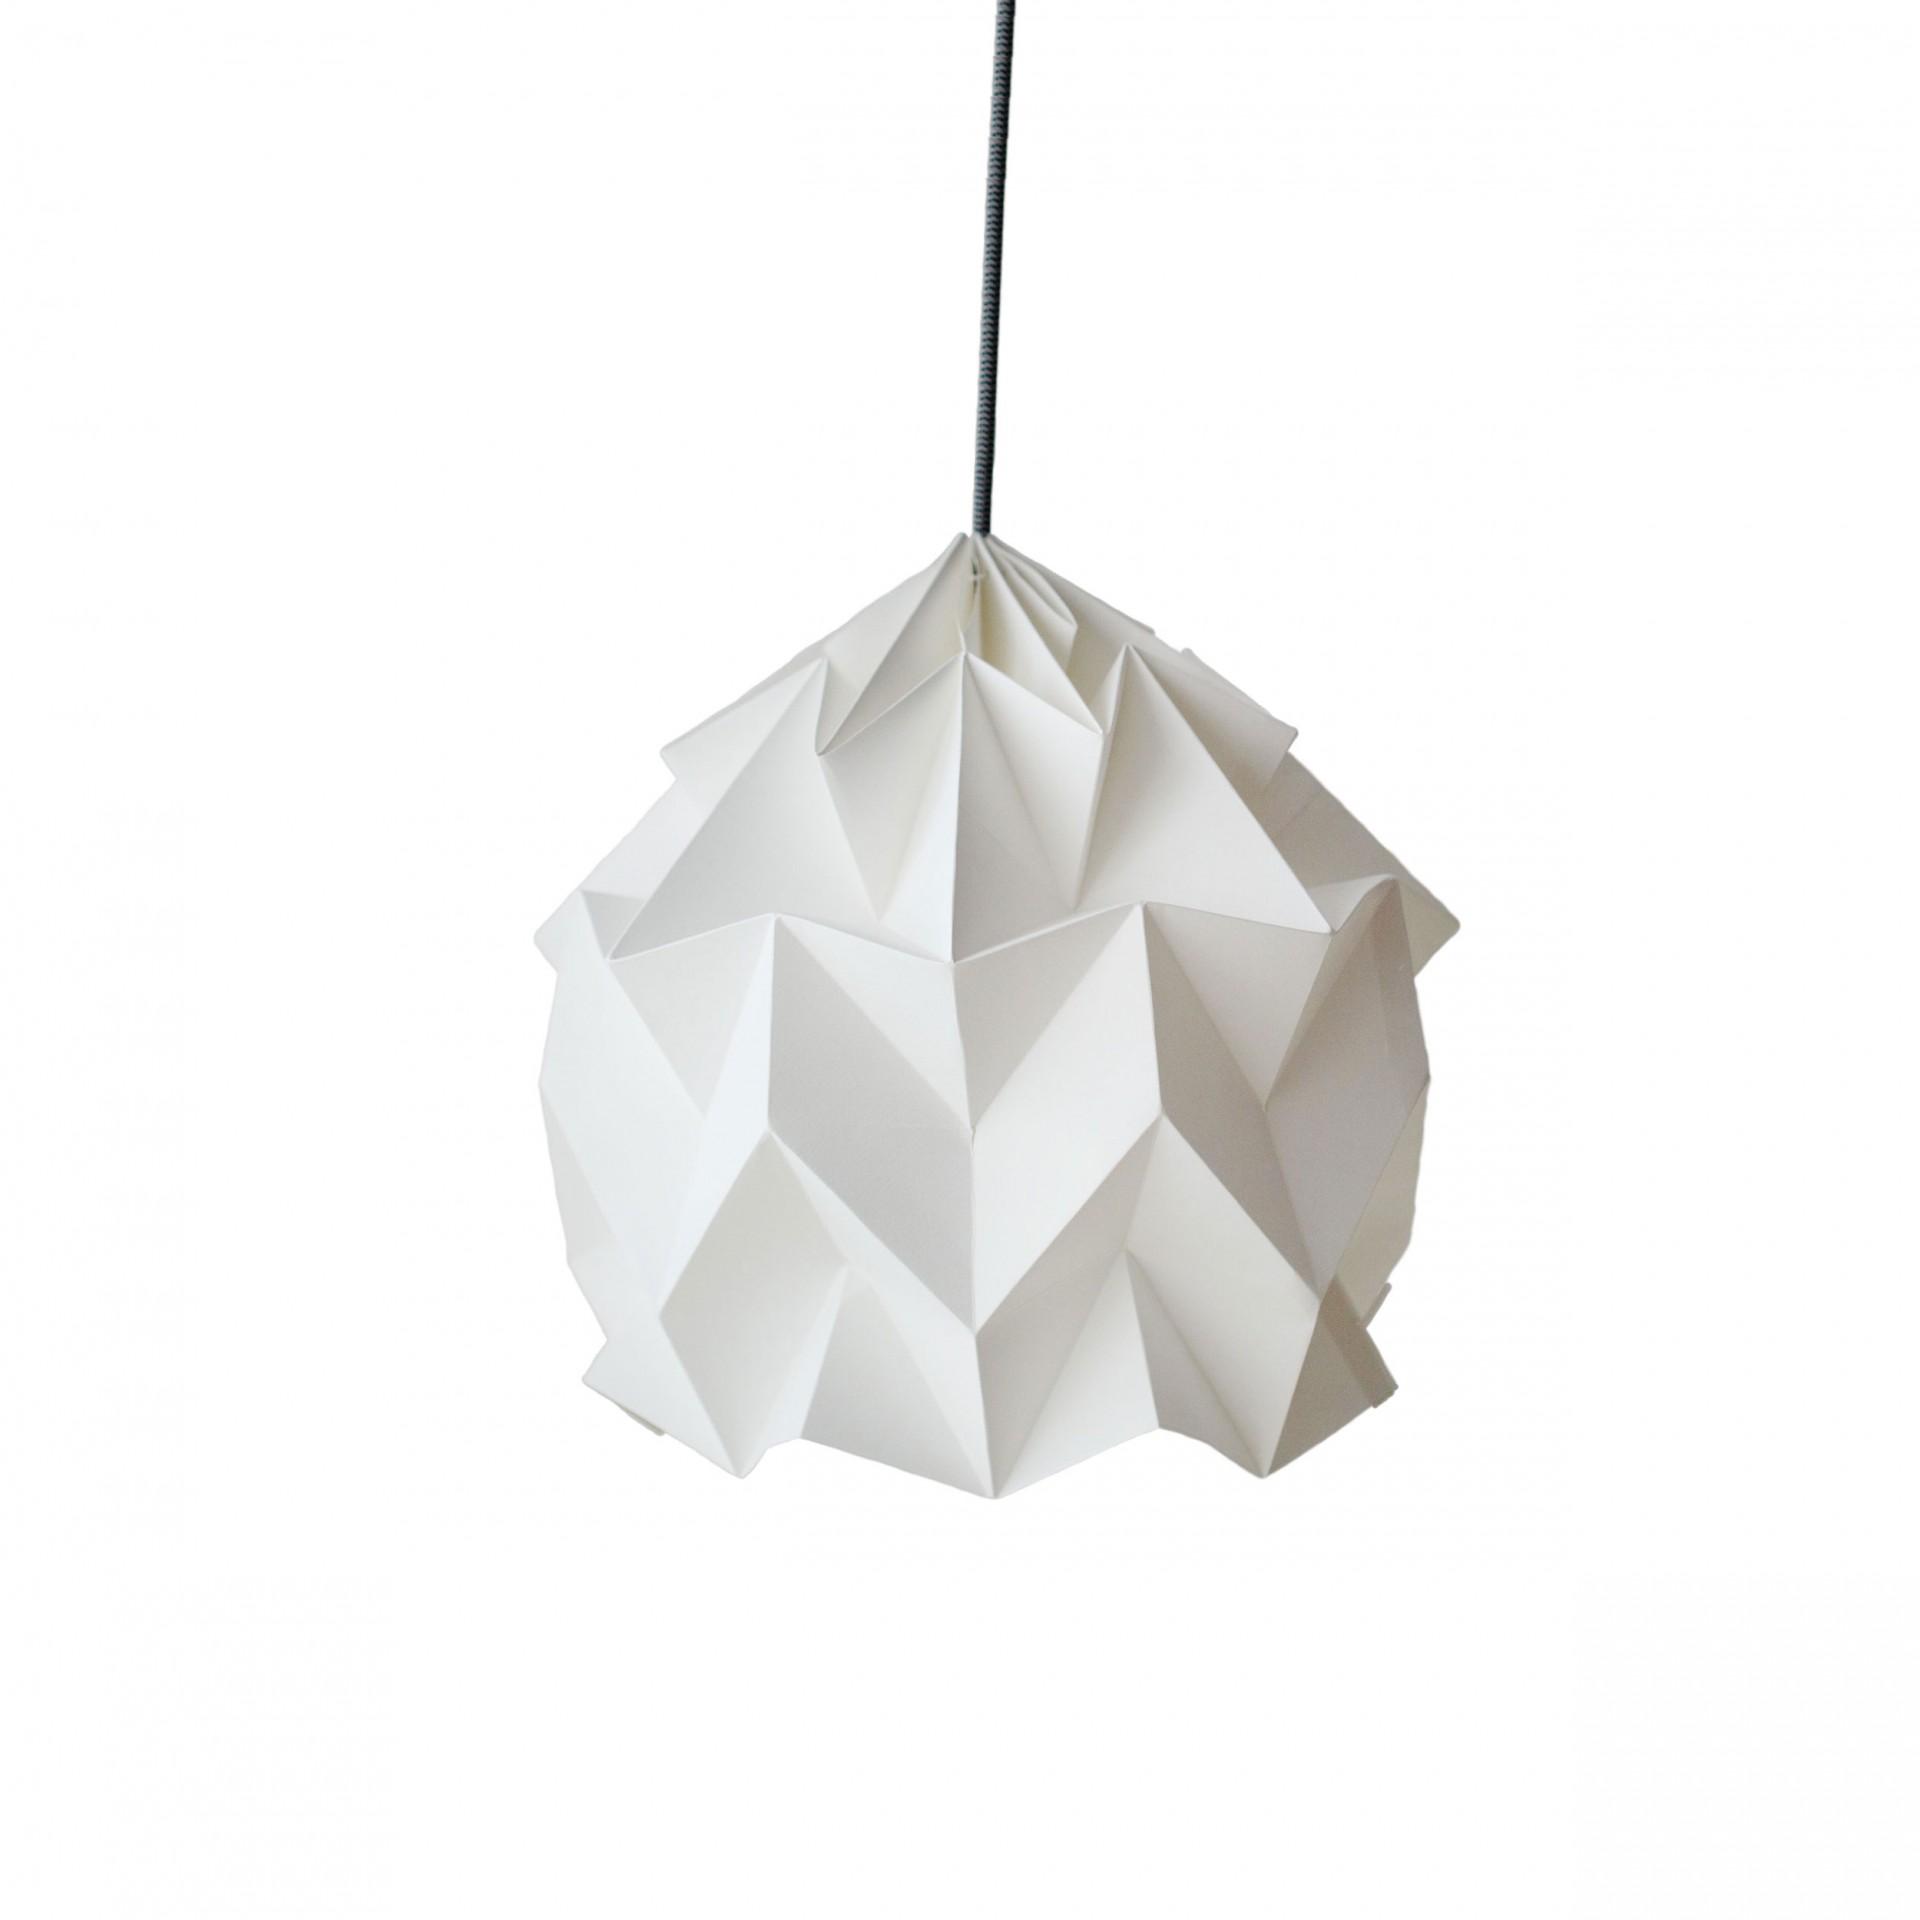 Abajur de papel Origâmi, modelo Luzada, branco